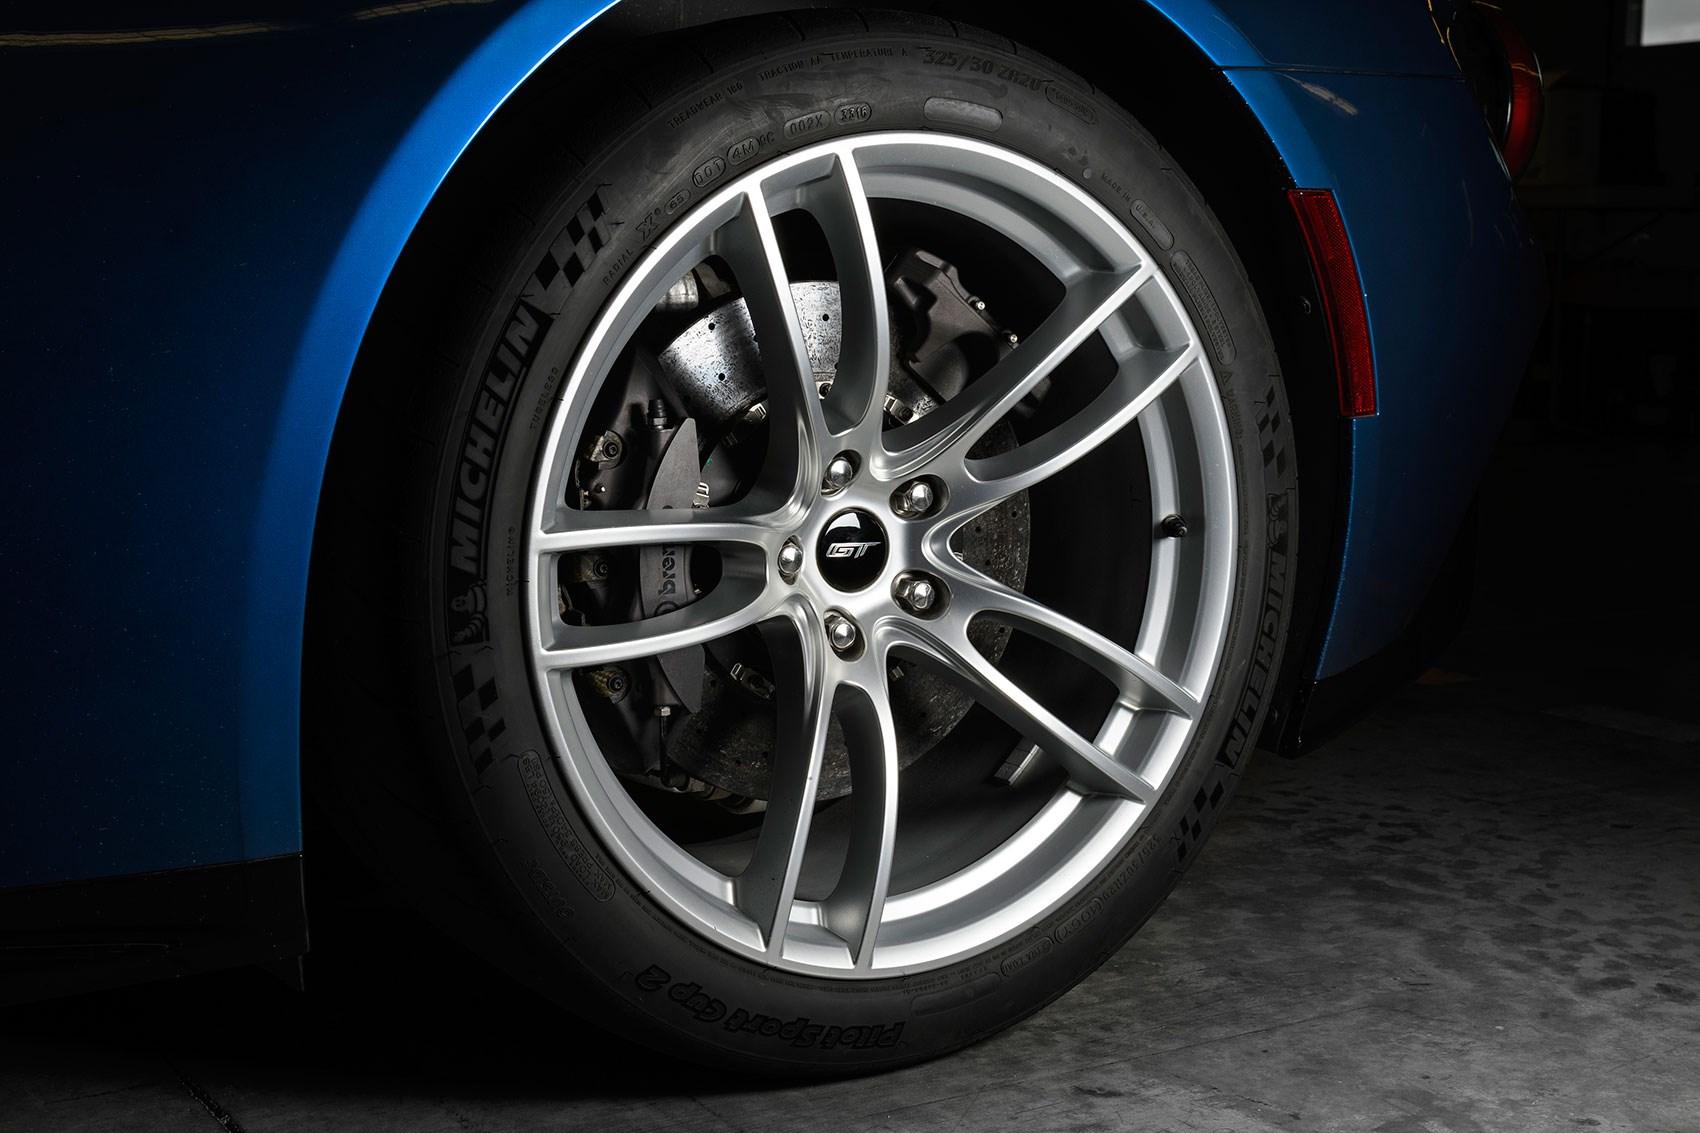 Ford GT alloy wheels: lightweight